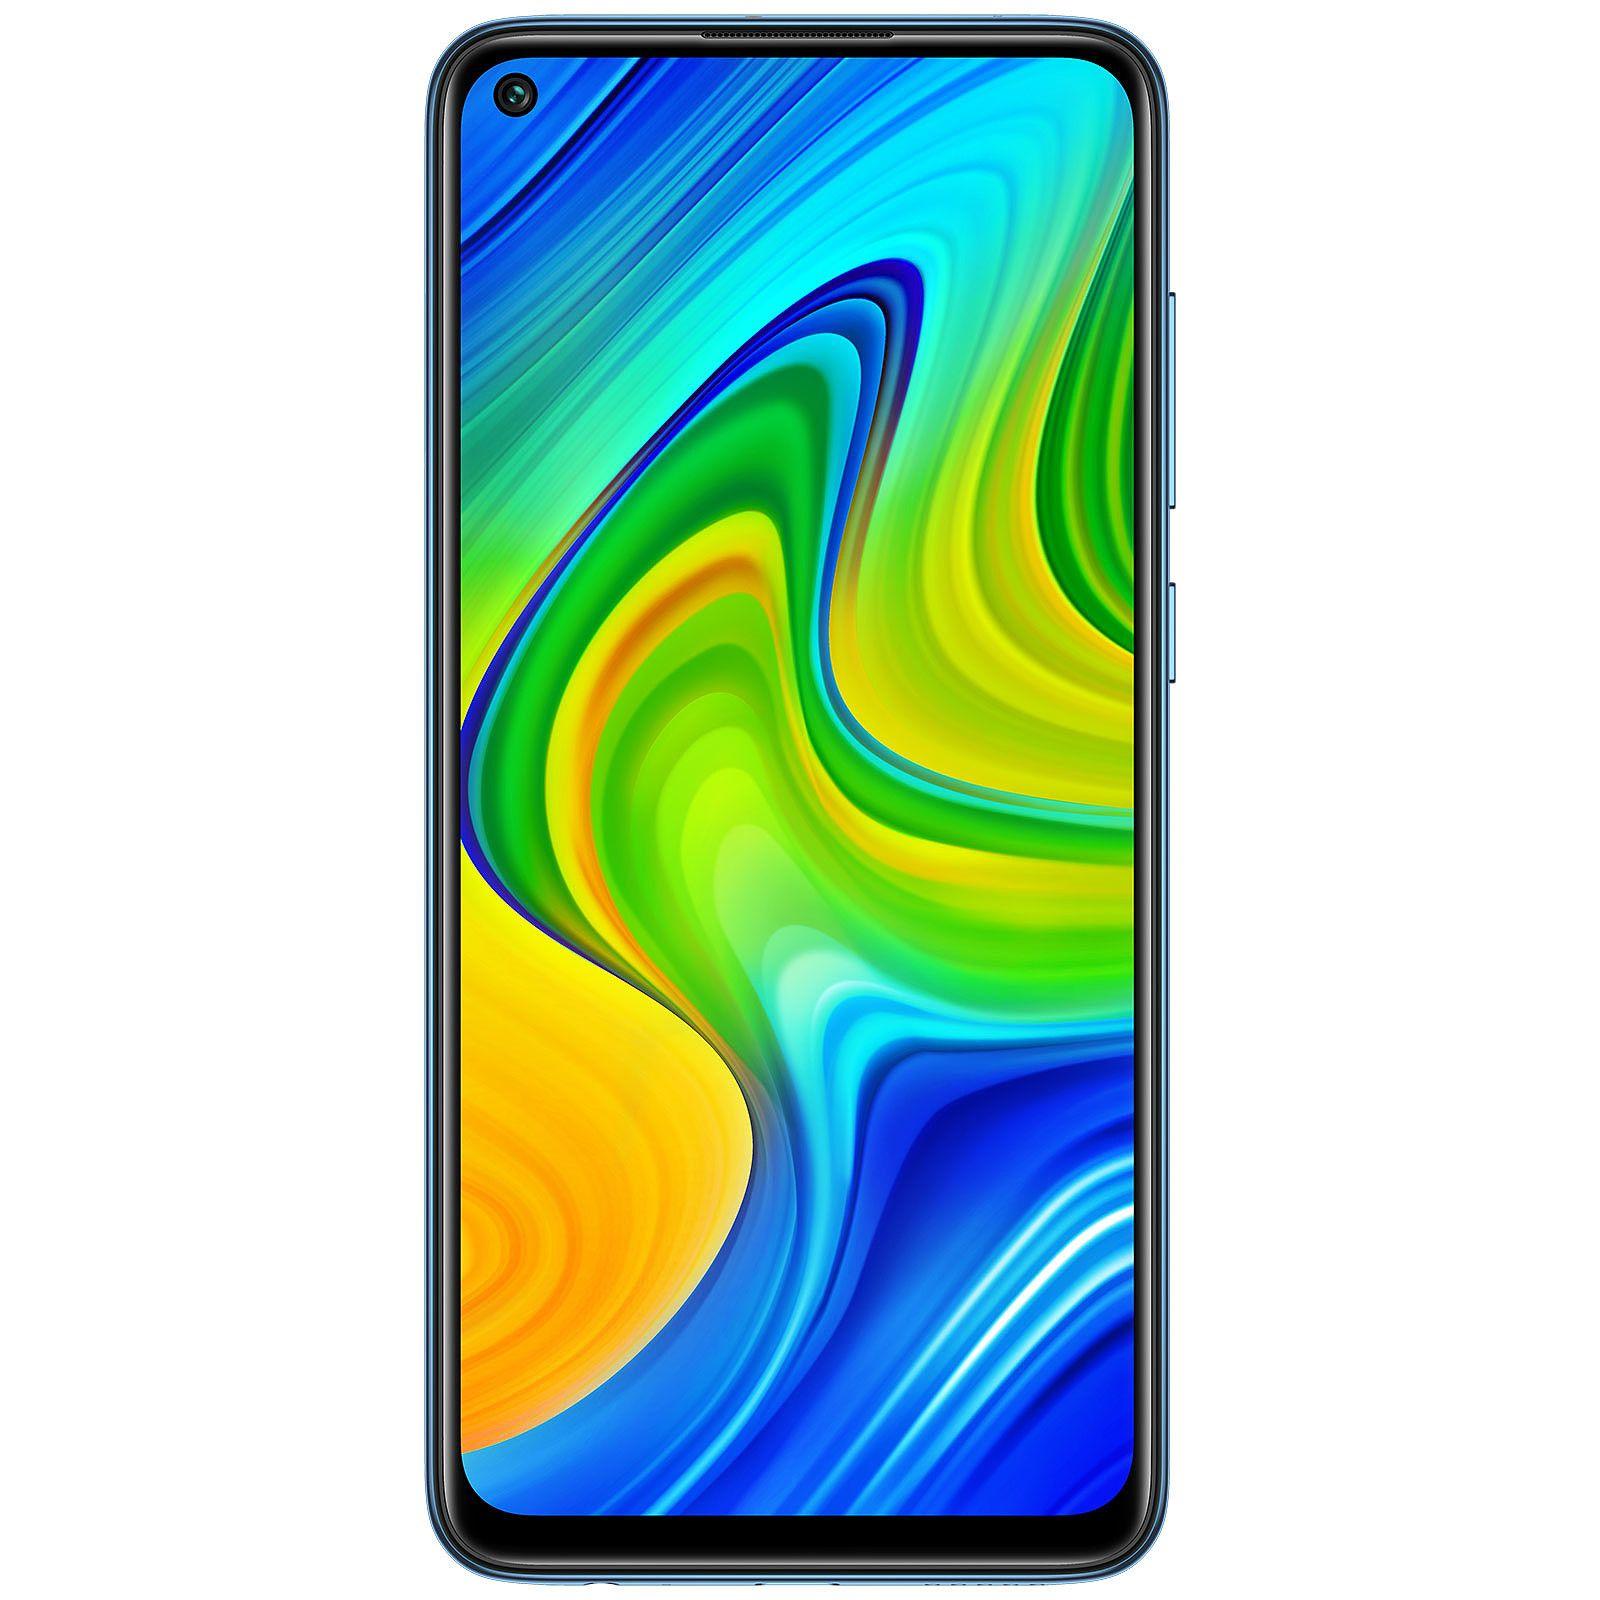 "Xiaomi Redmi Note 9 128/4GB - Versand aus DE (Helio G85, 6.53"" FHD Display, 5020mAh Akku, 48MP Kamera, Triple Slot, Klinke, IR, 199 Gramm)"